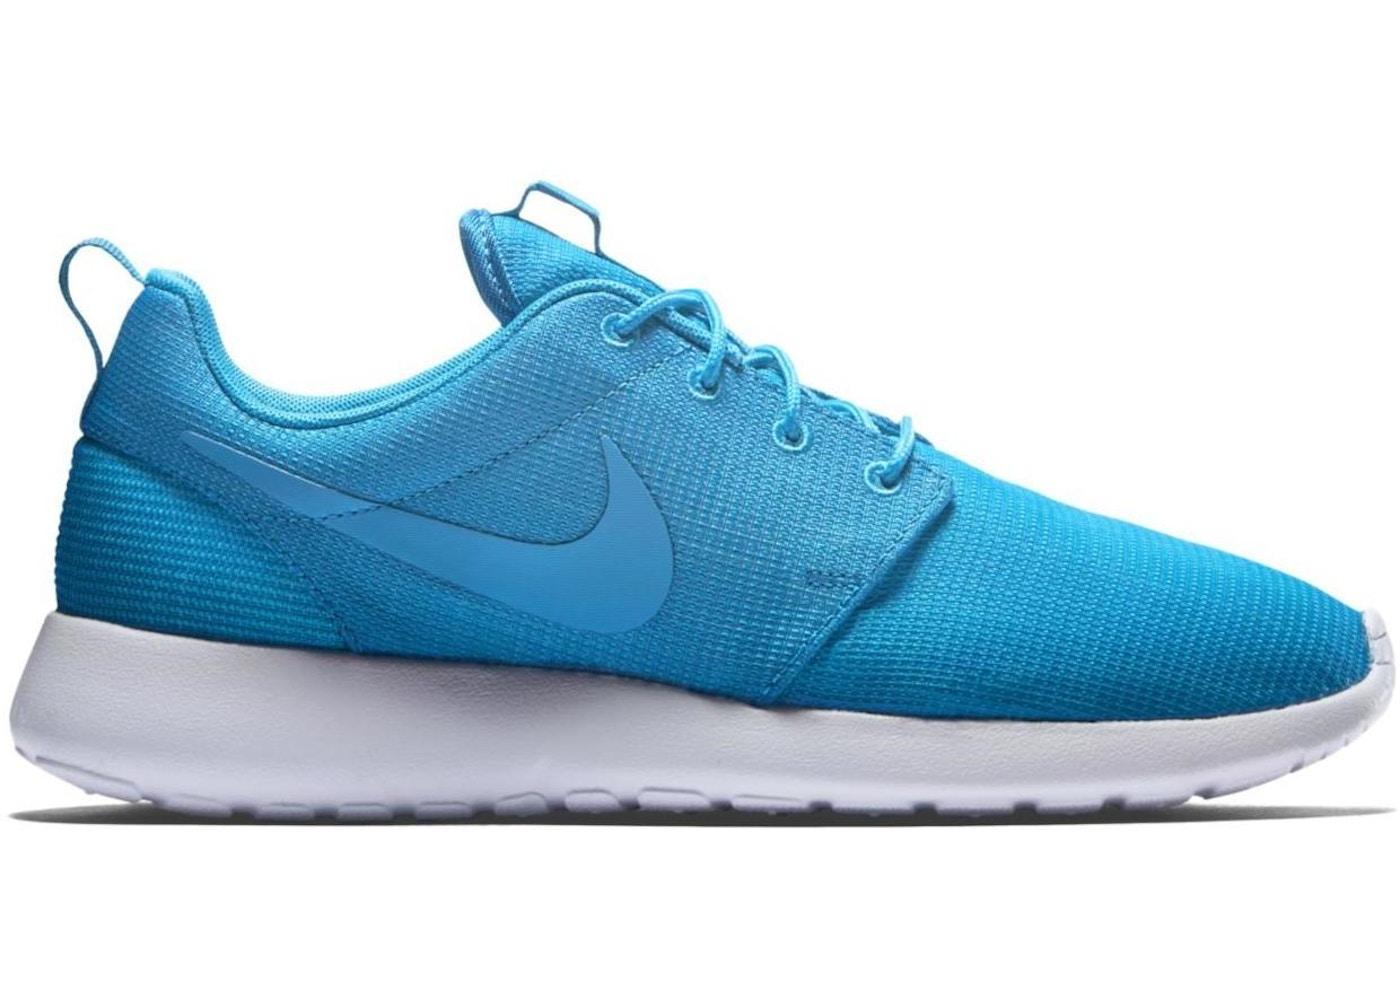 df97445154d Nike Roshe Run Blue Lagoon - 511881-447